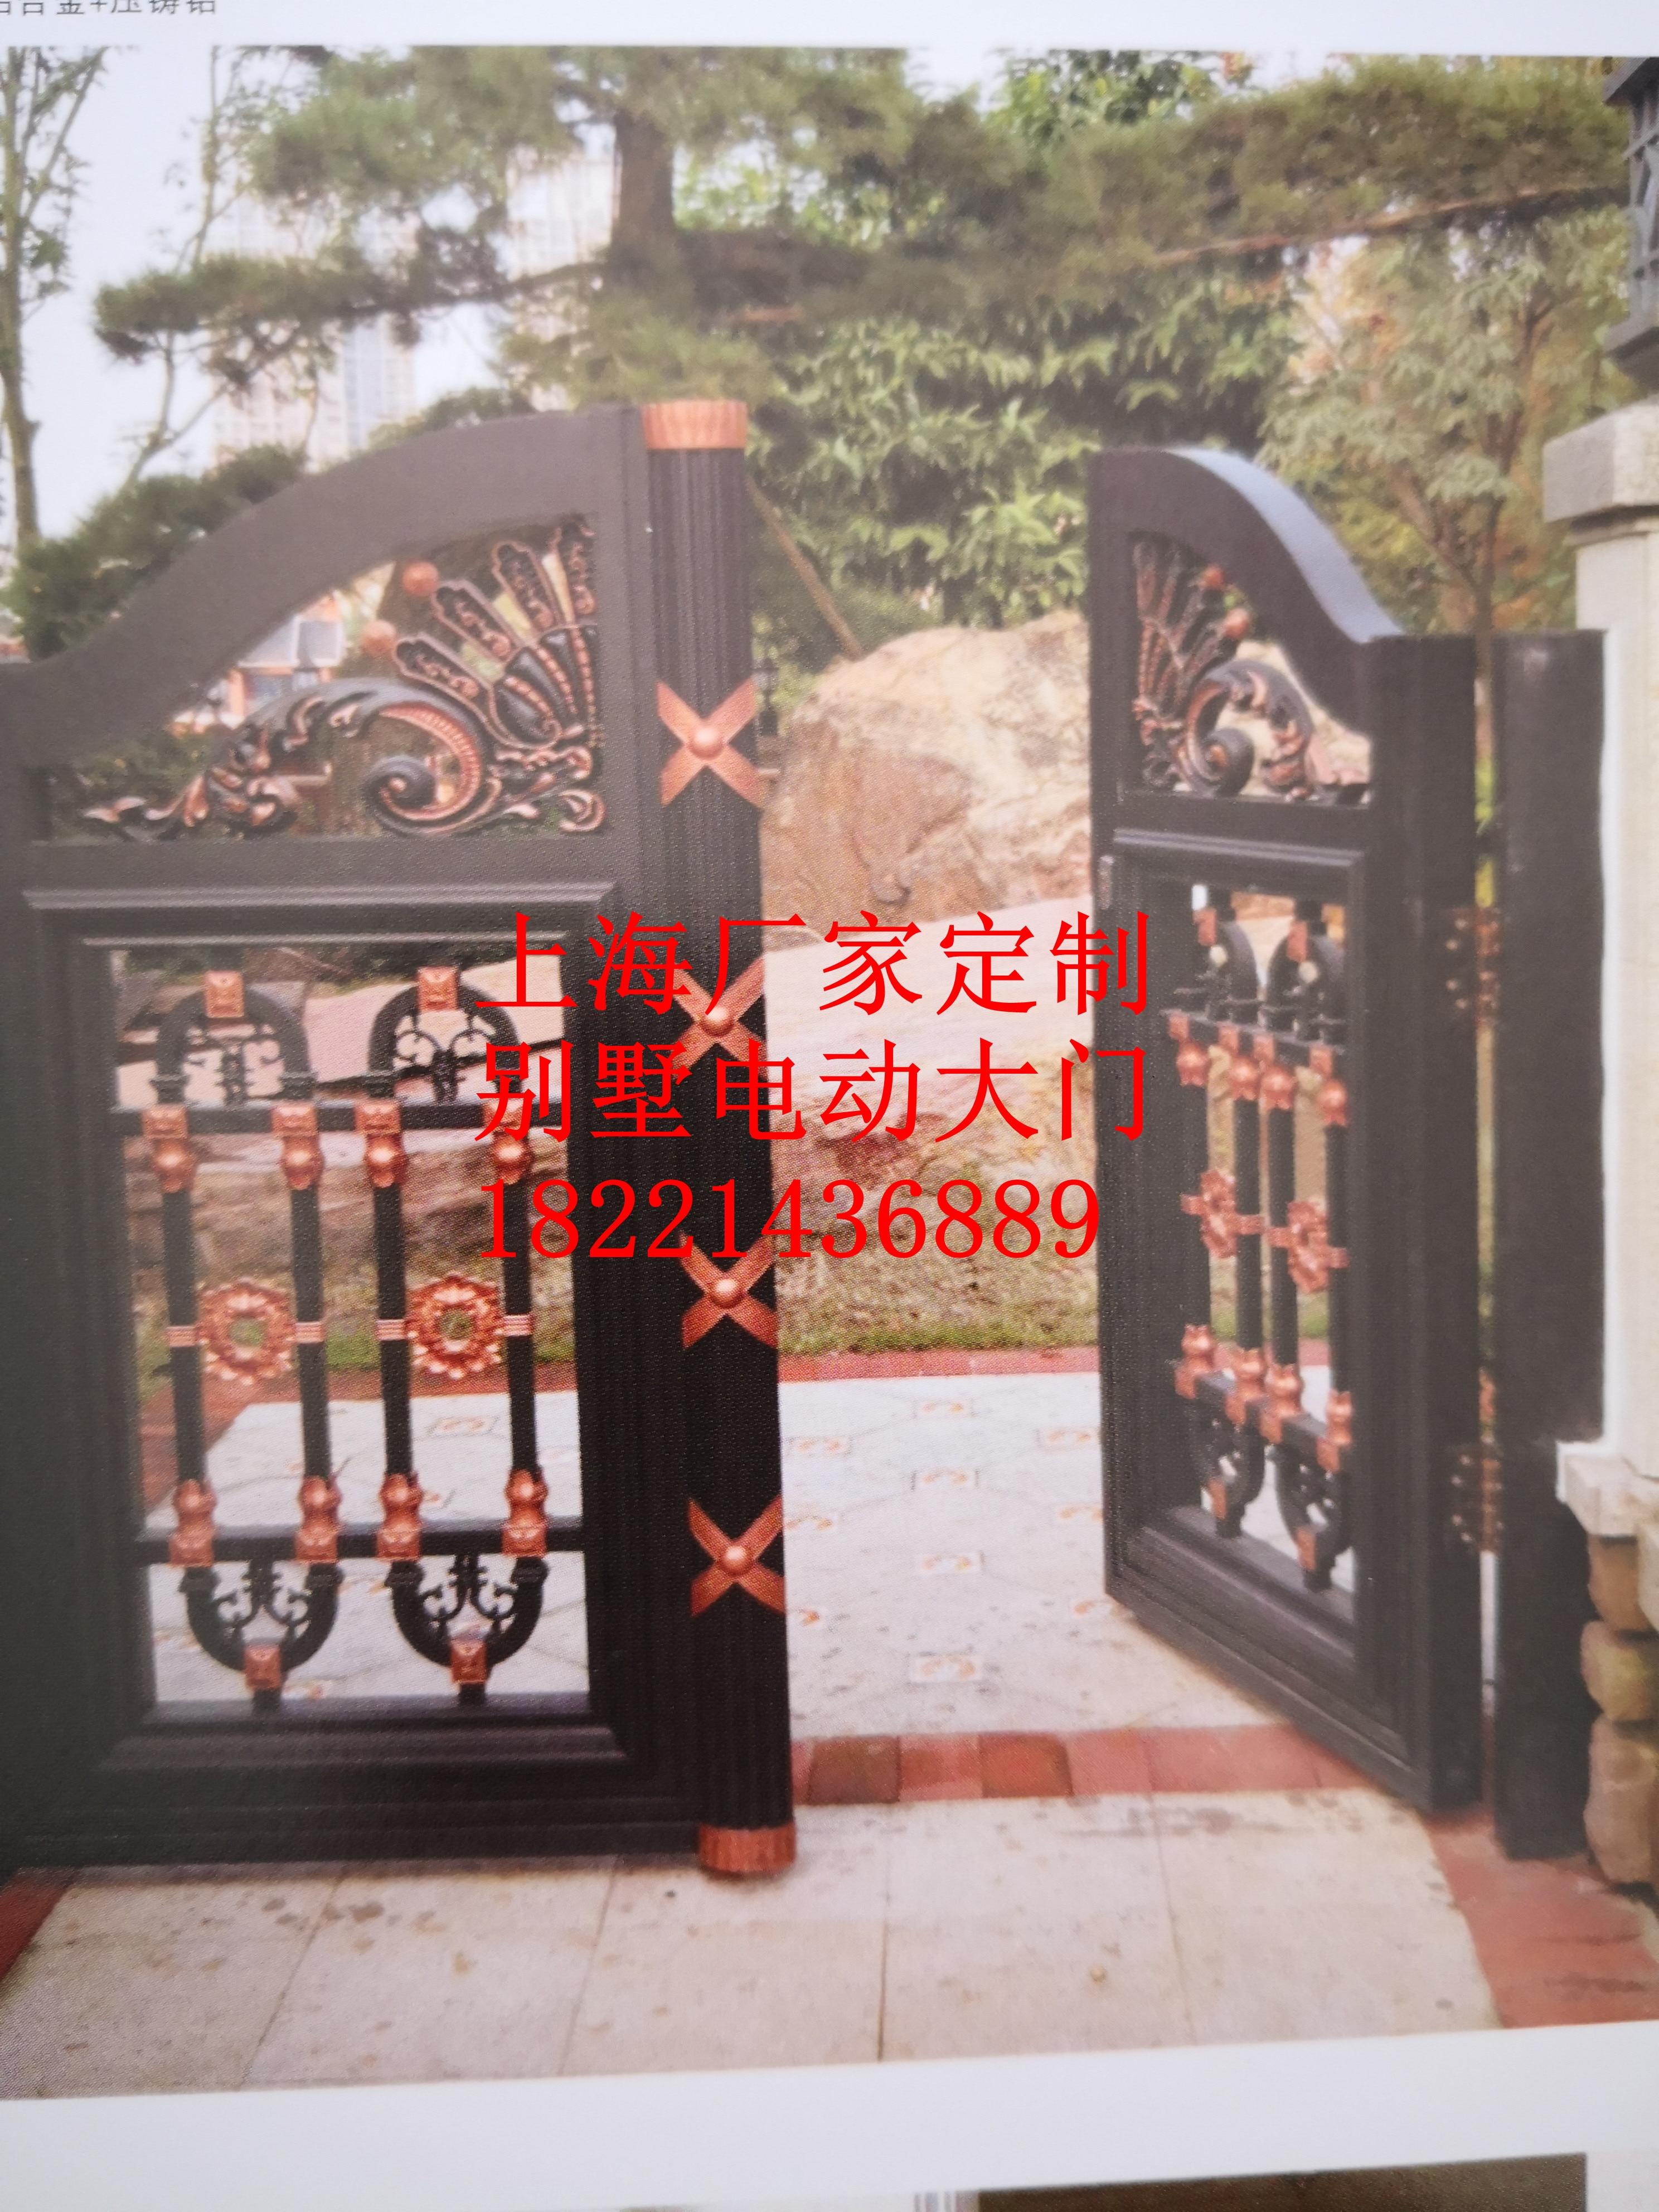 Shanghai Hench  Custom USA Australia Home Use Metal Gates Home Depot